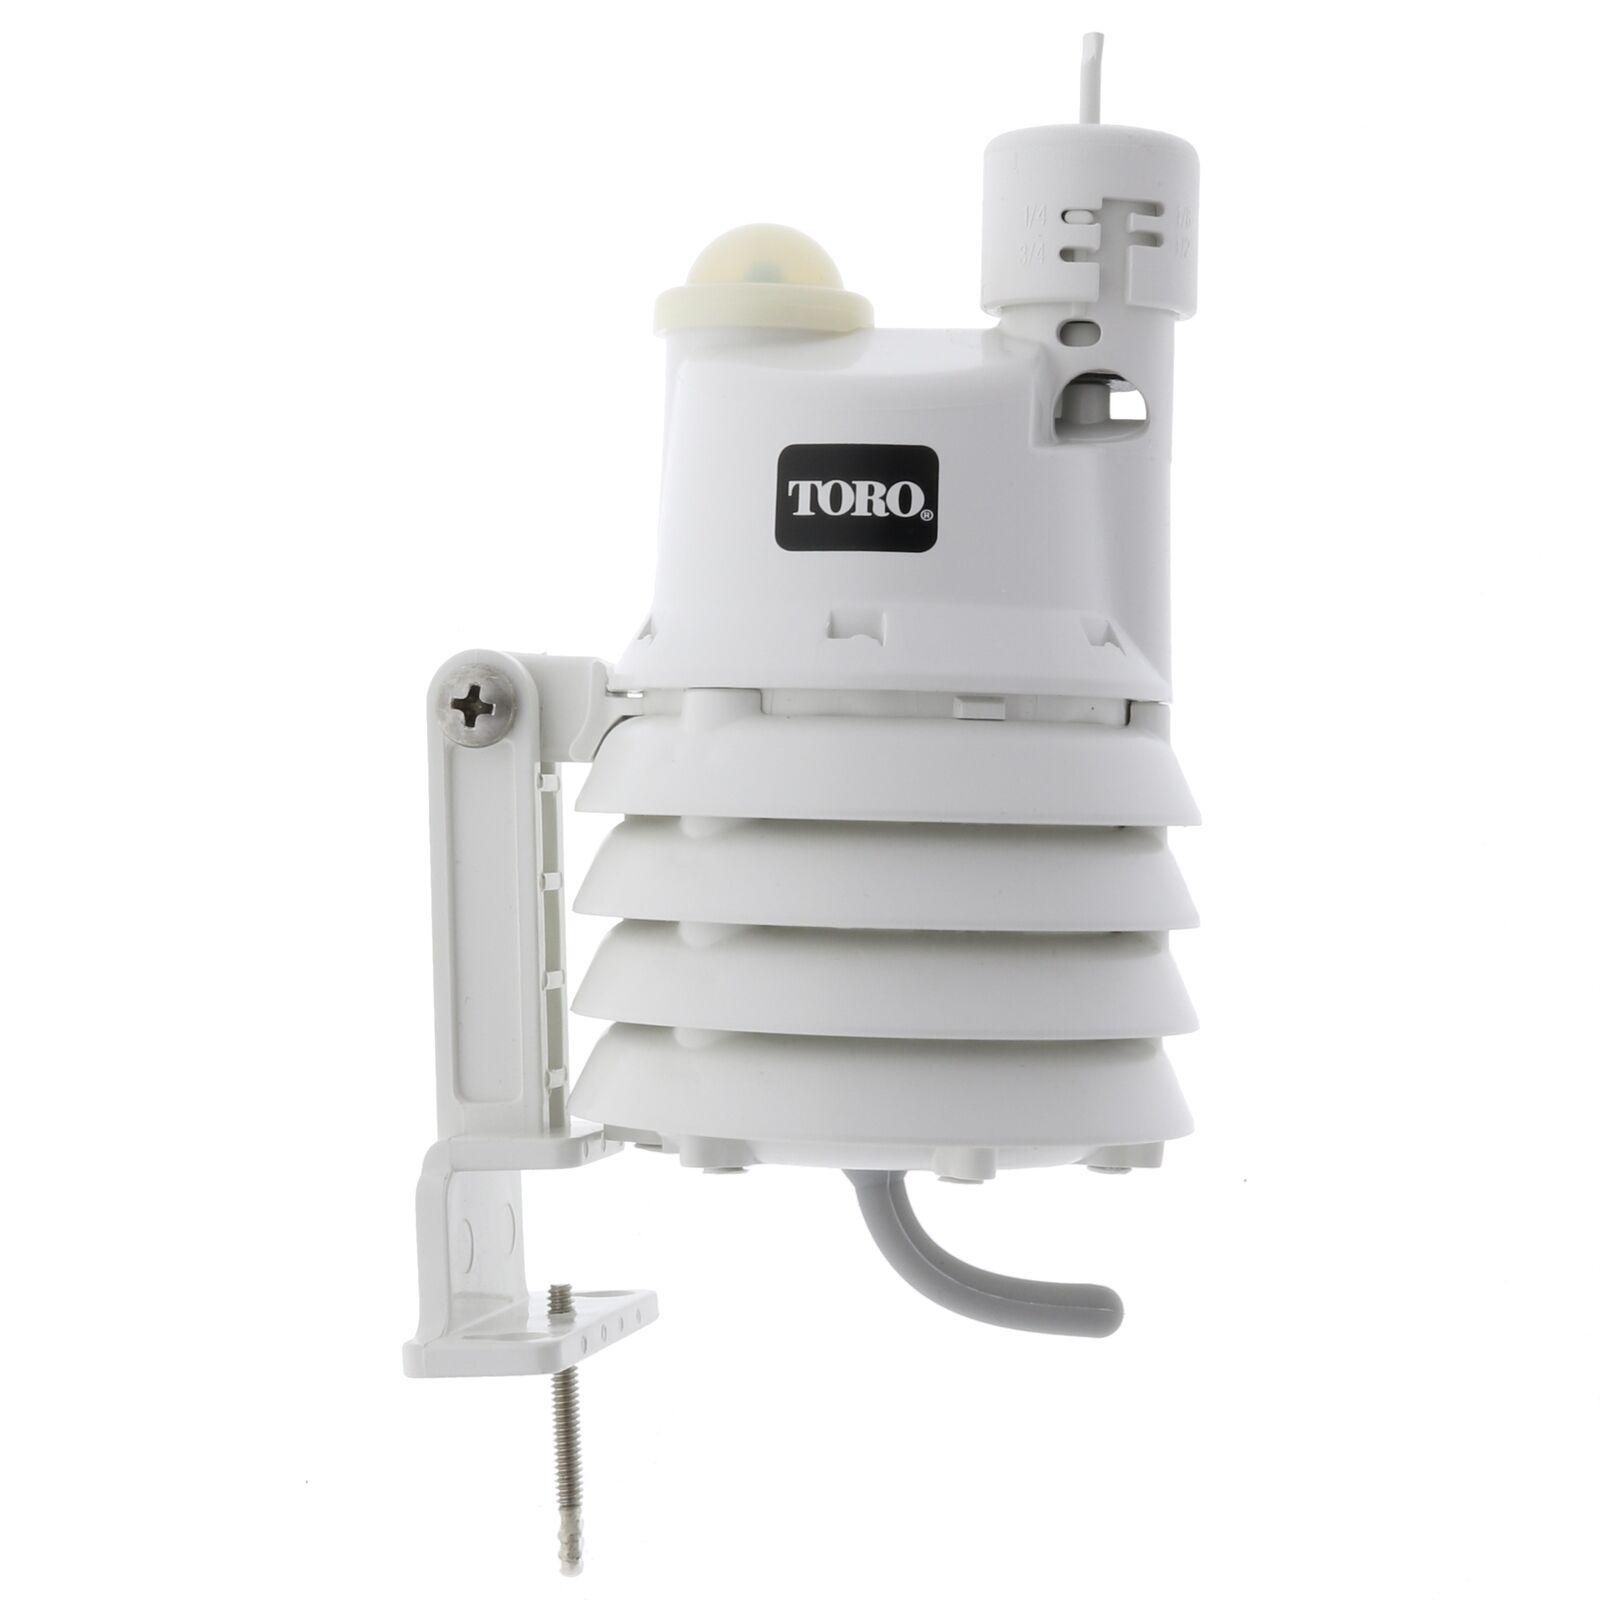 Toro Evolution AG Wireless Weather Sensor